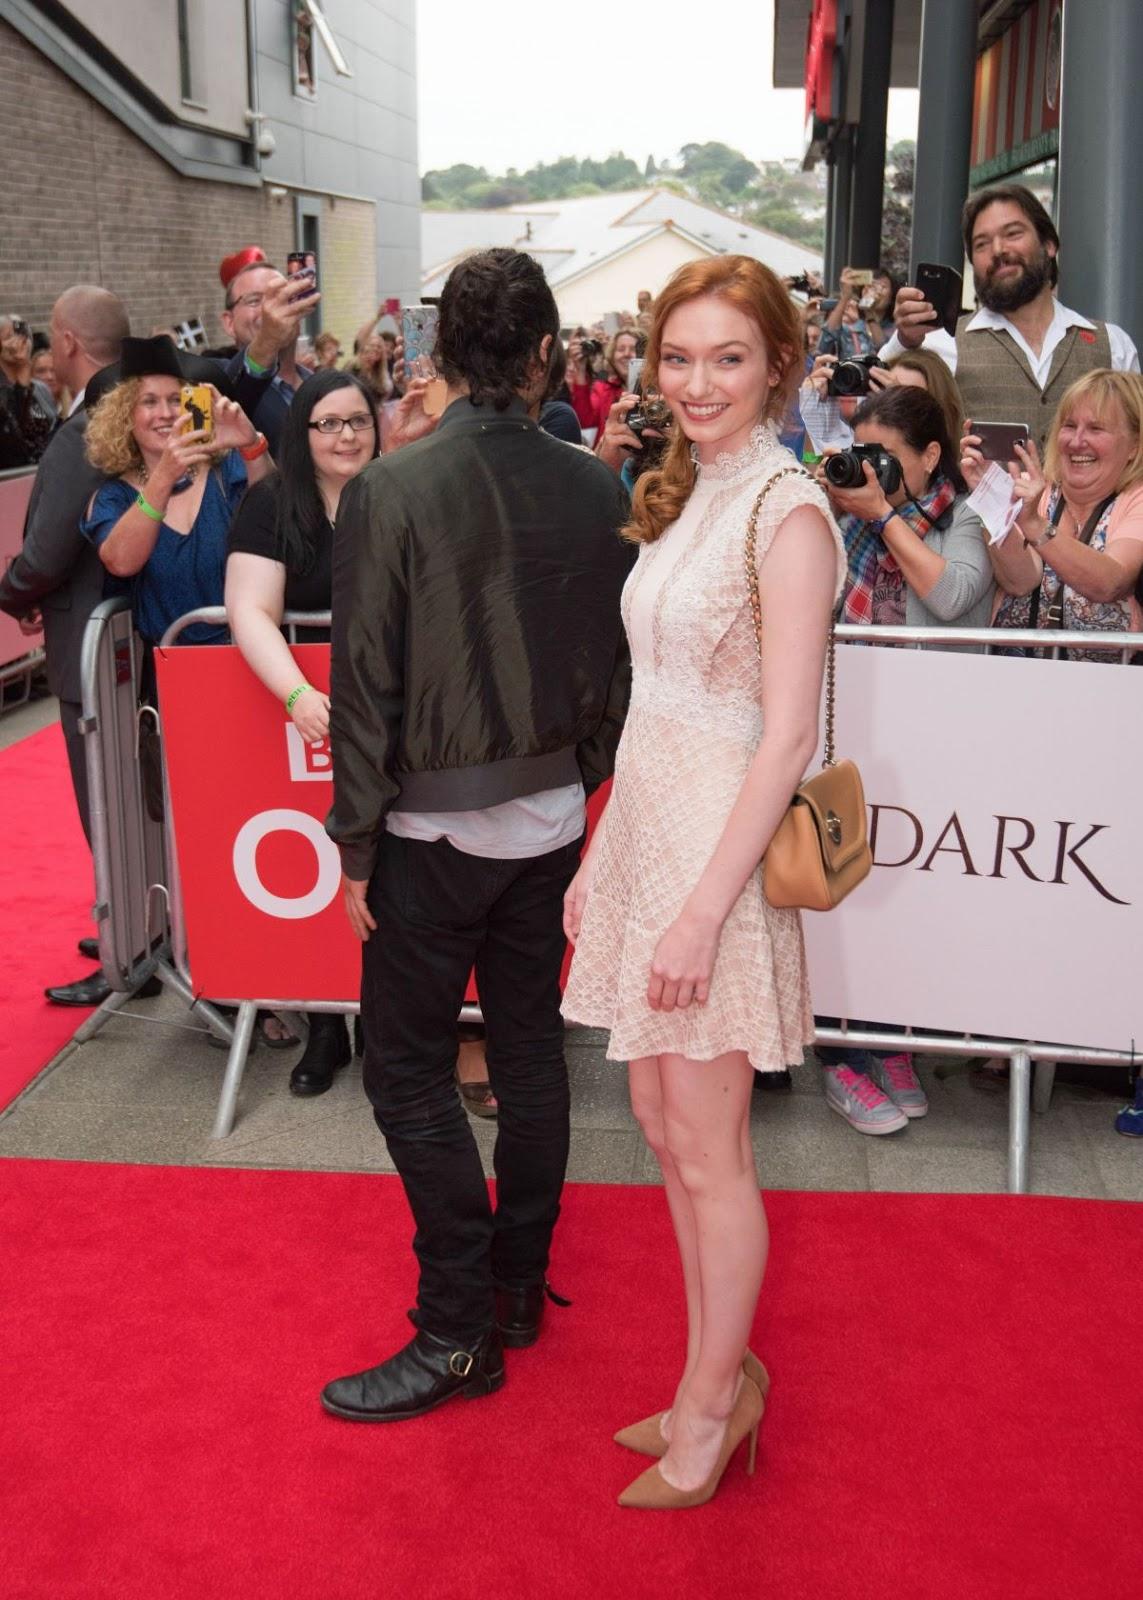 Full 4K Photos of 'Poldark' actress Eleanor Tomlinson At Poldark Press Screening In Cornwall